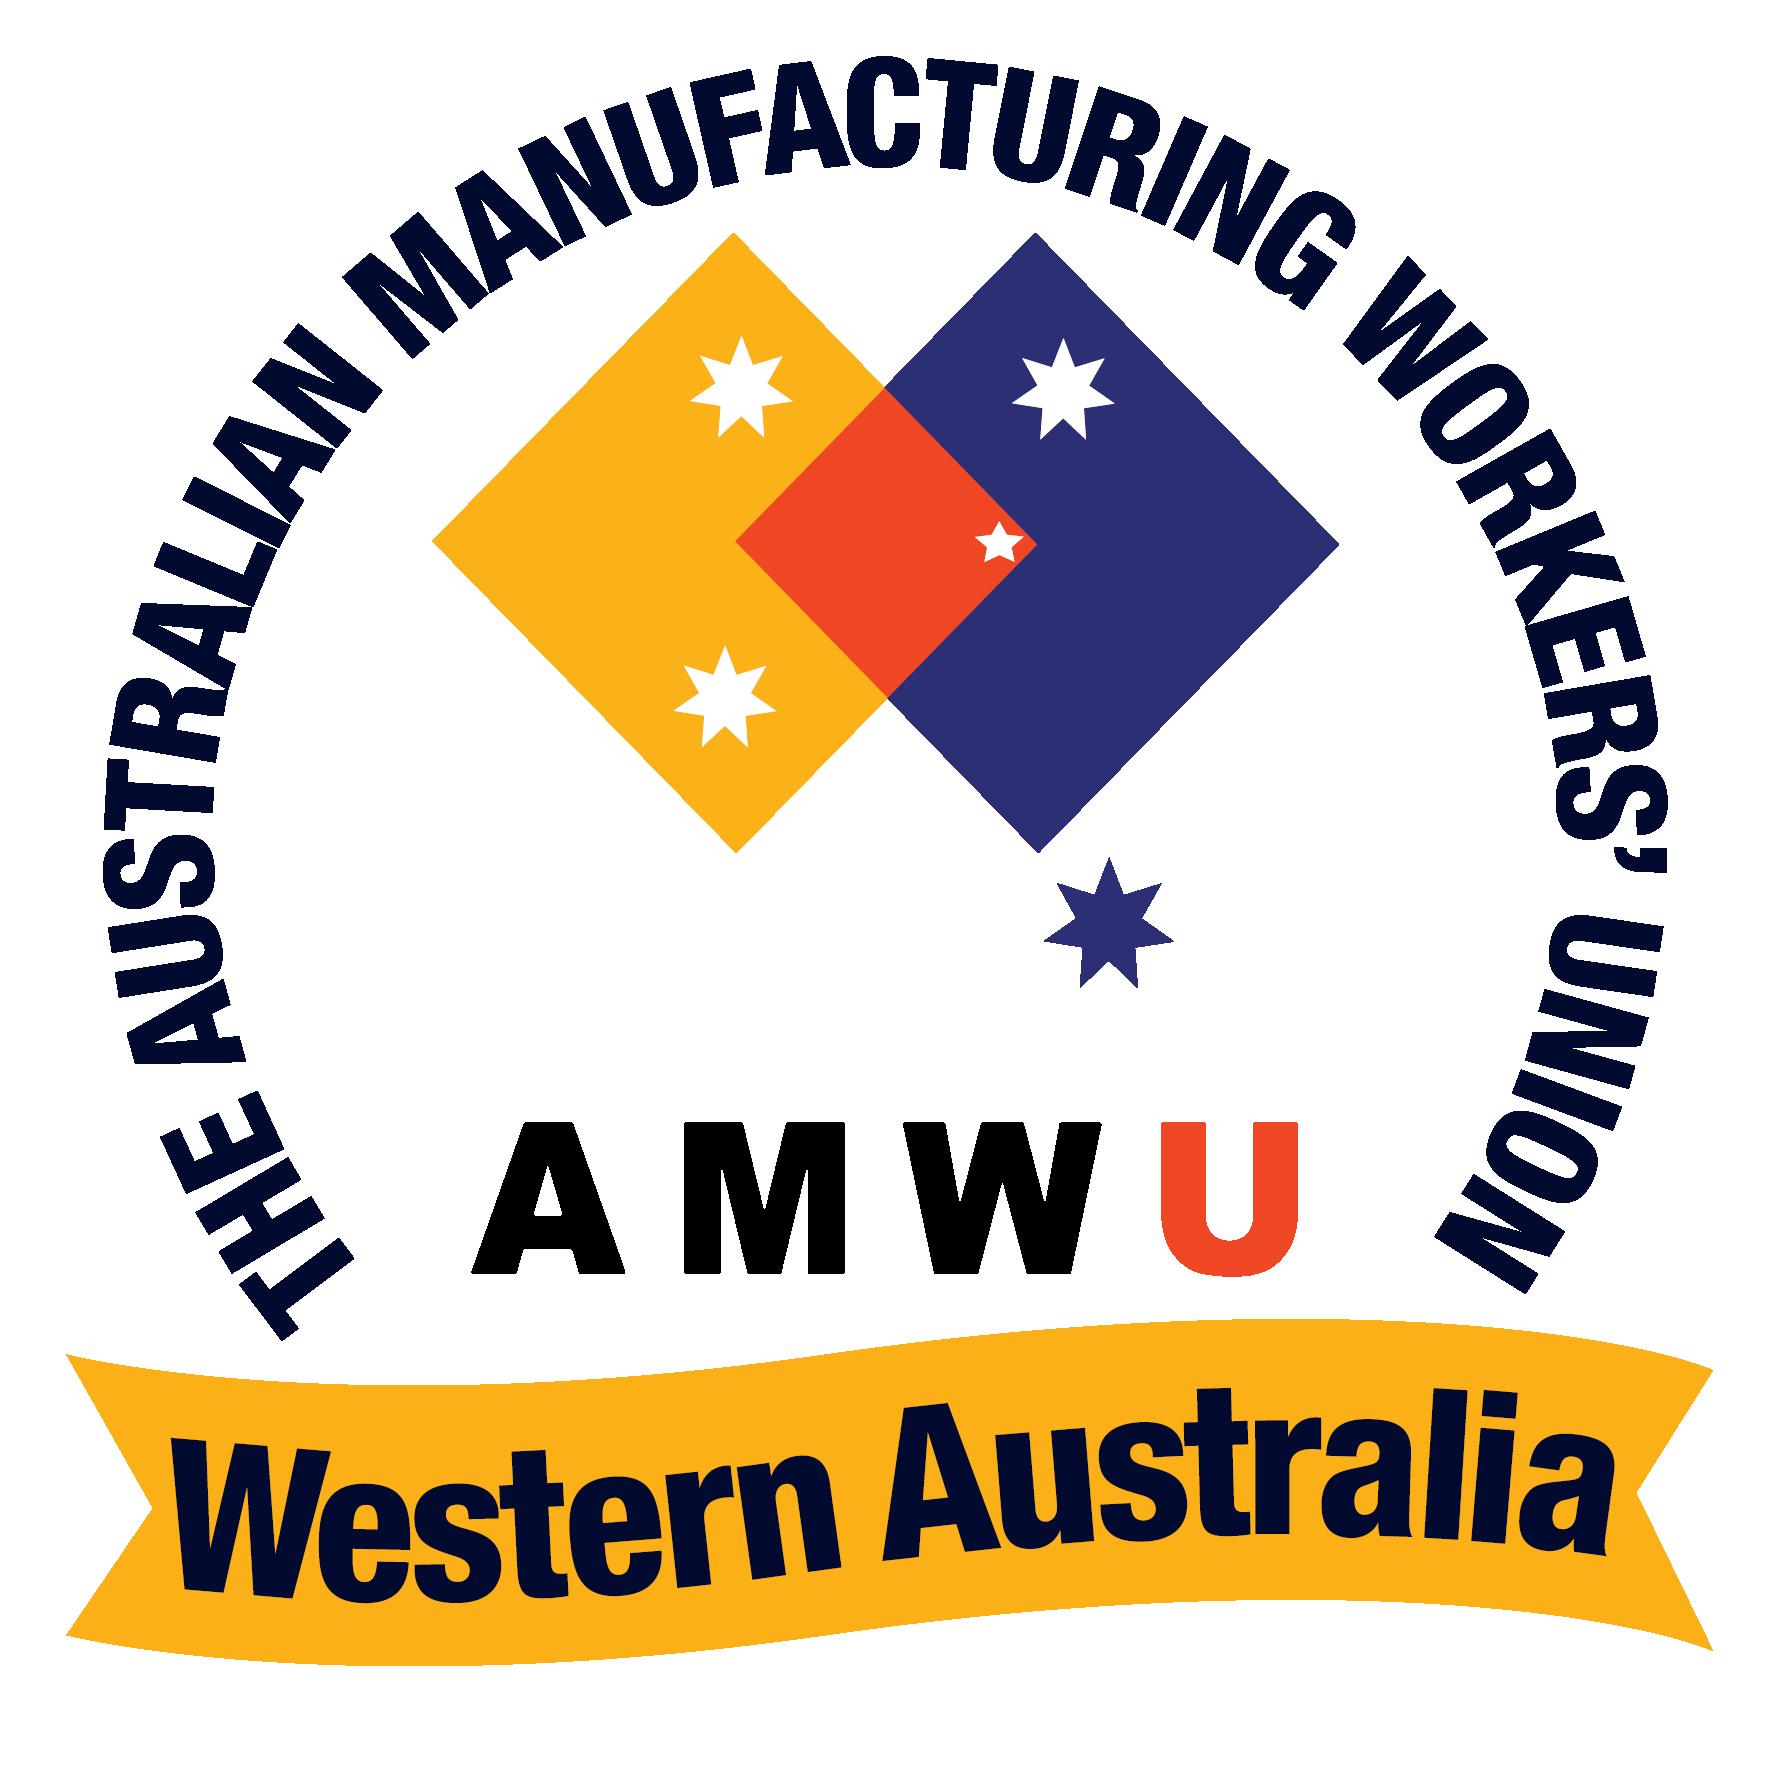 AMWU_WA_State_Logo_v_3_transparent_bacground.png